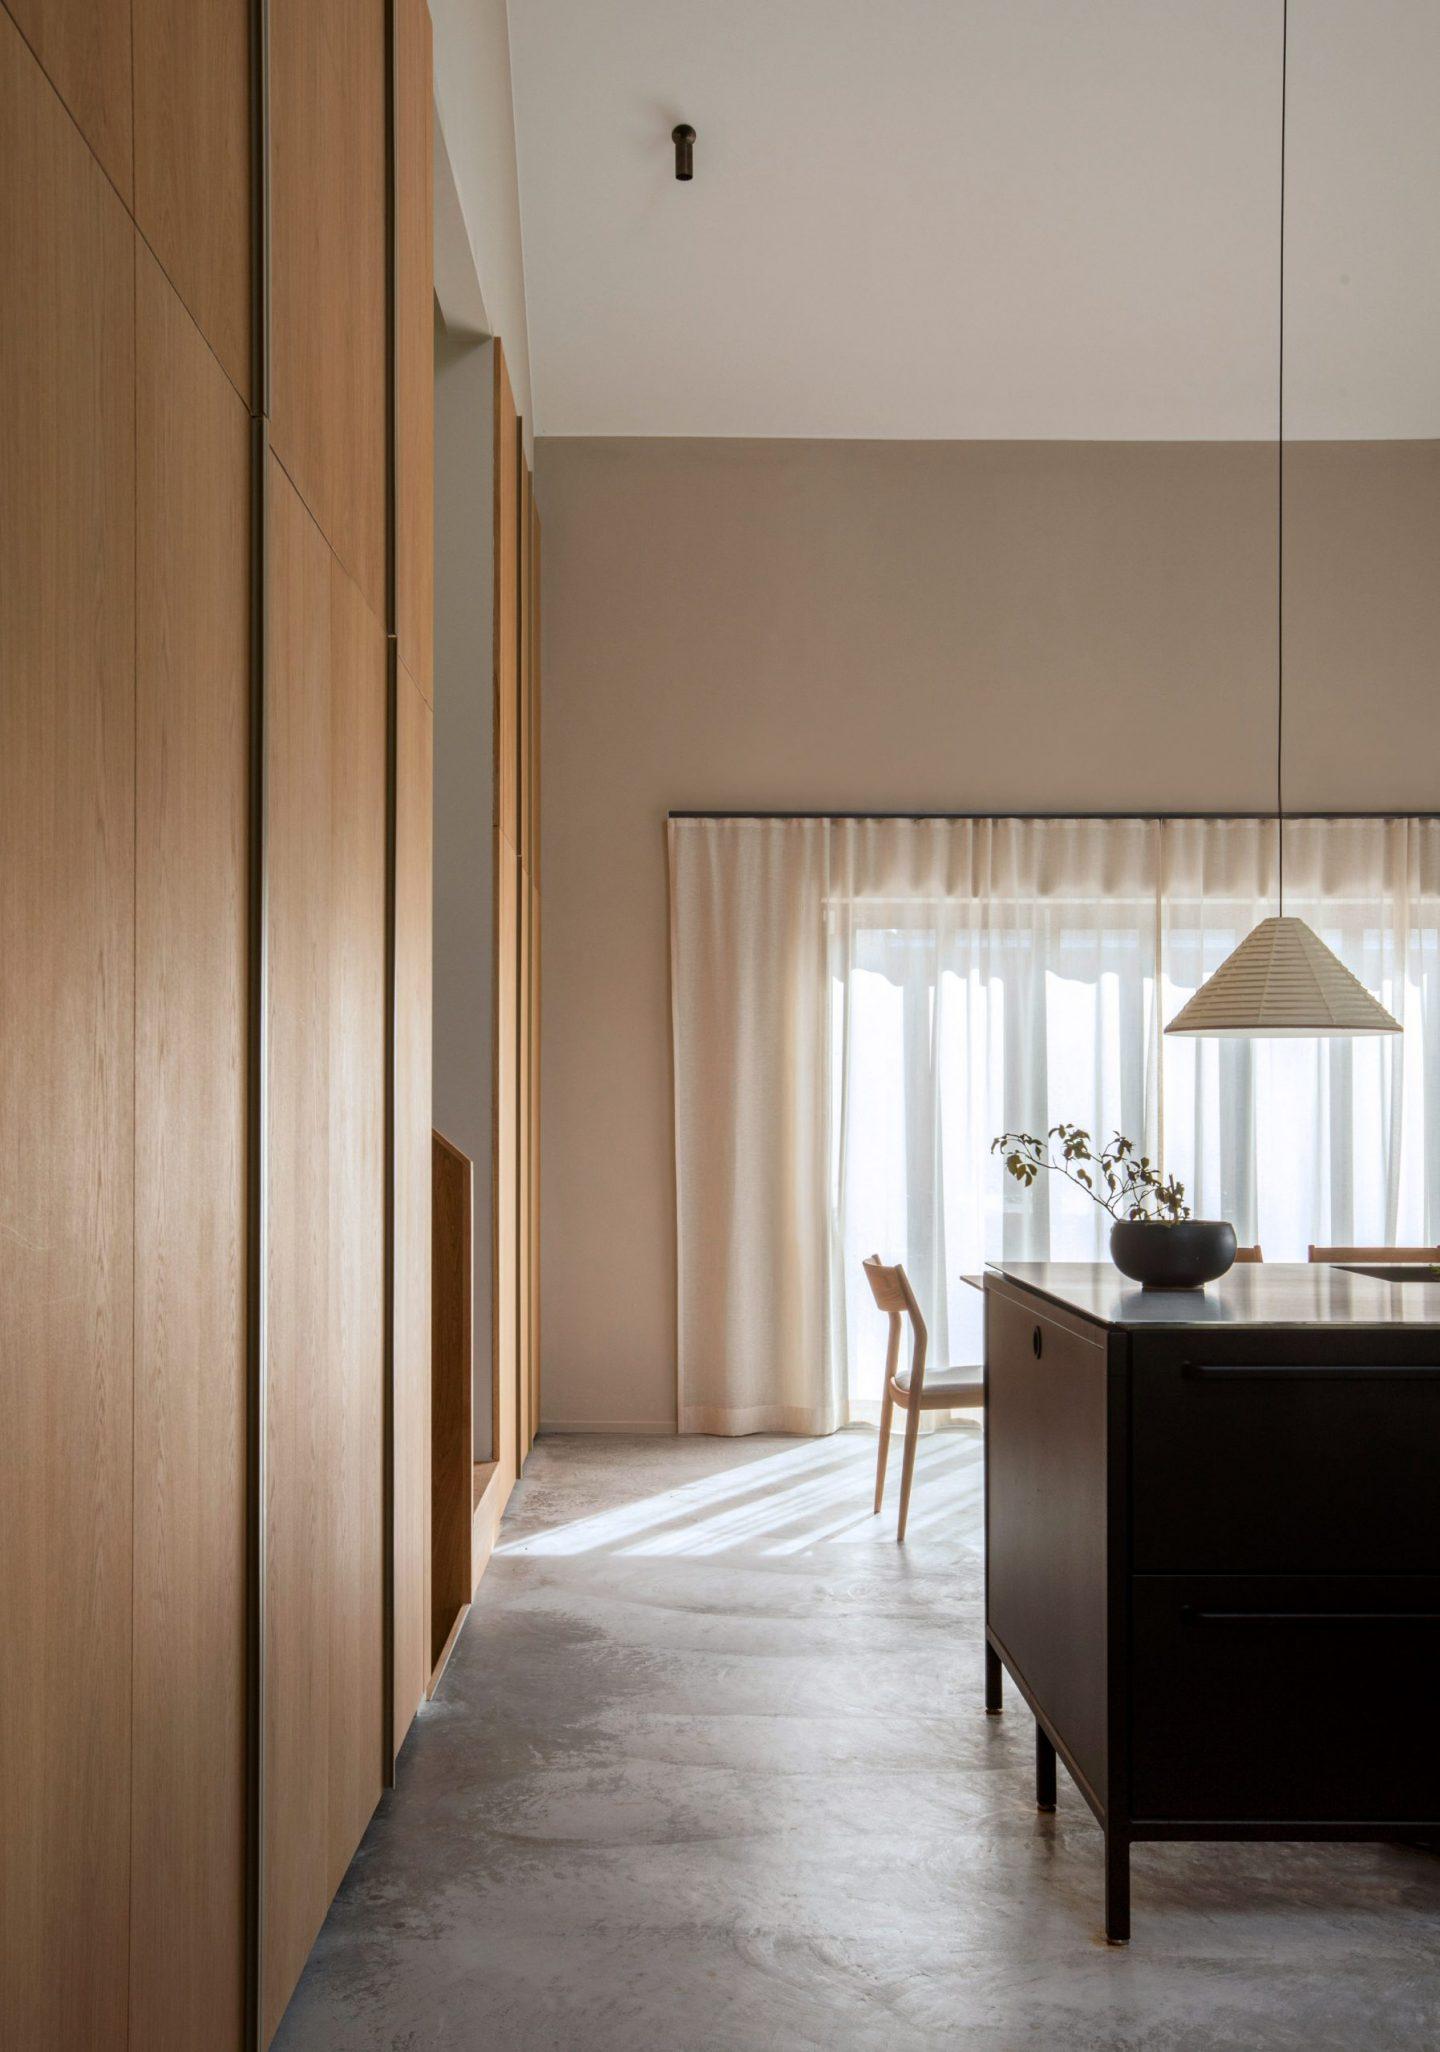 IGNANT-Architecture-Norm-Architects-Archipelago-House-016